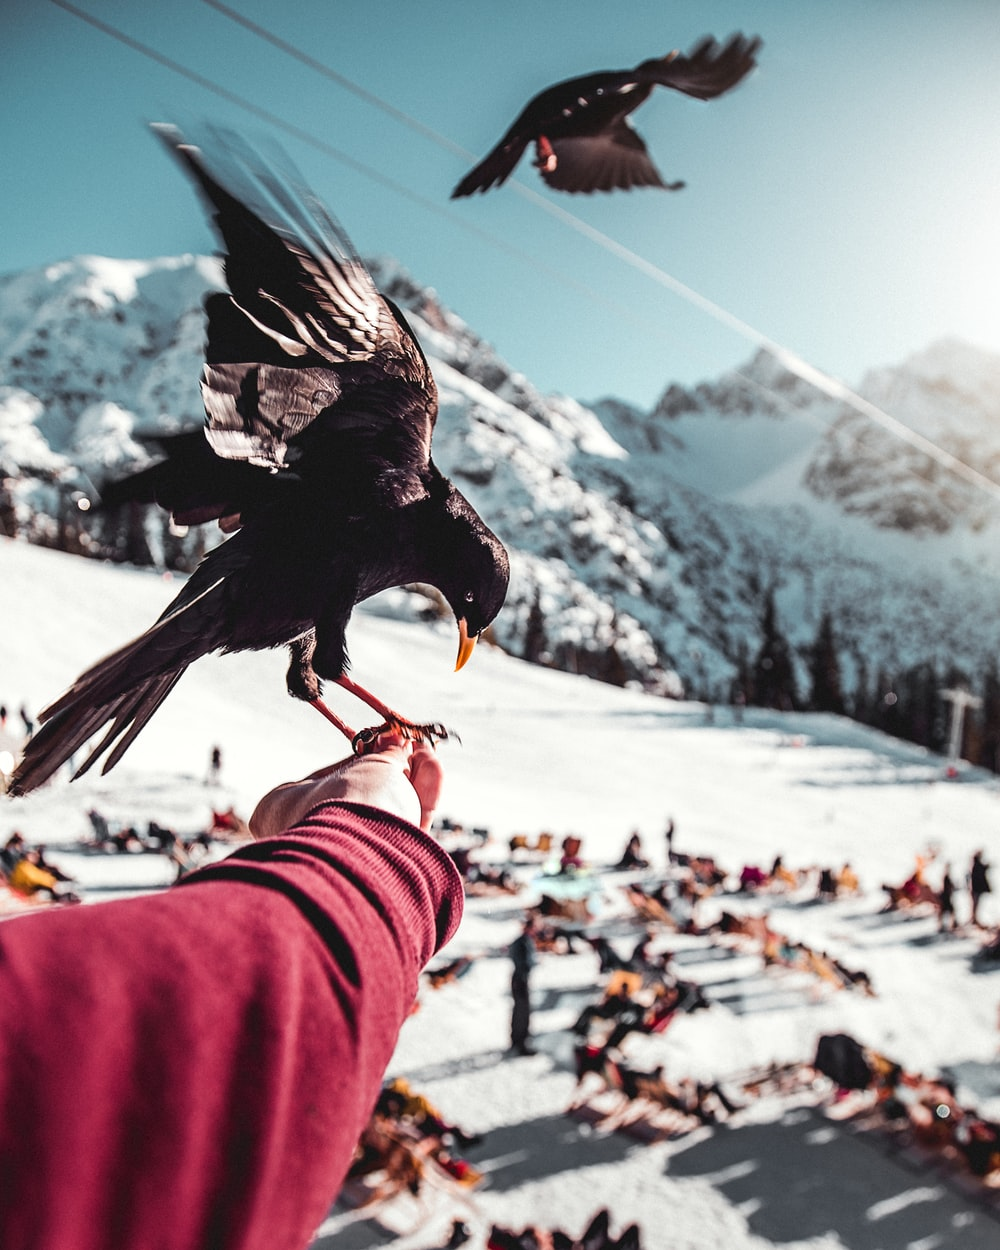 short-beaked black bird perched on left human hand